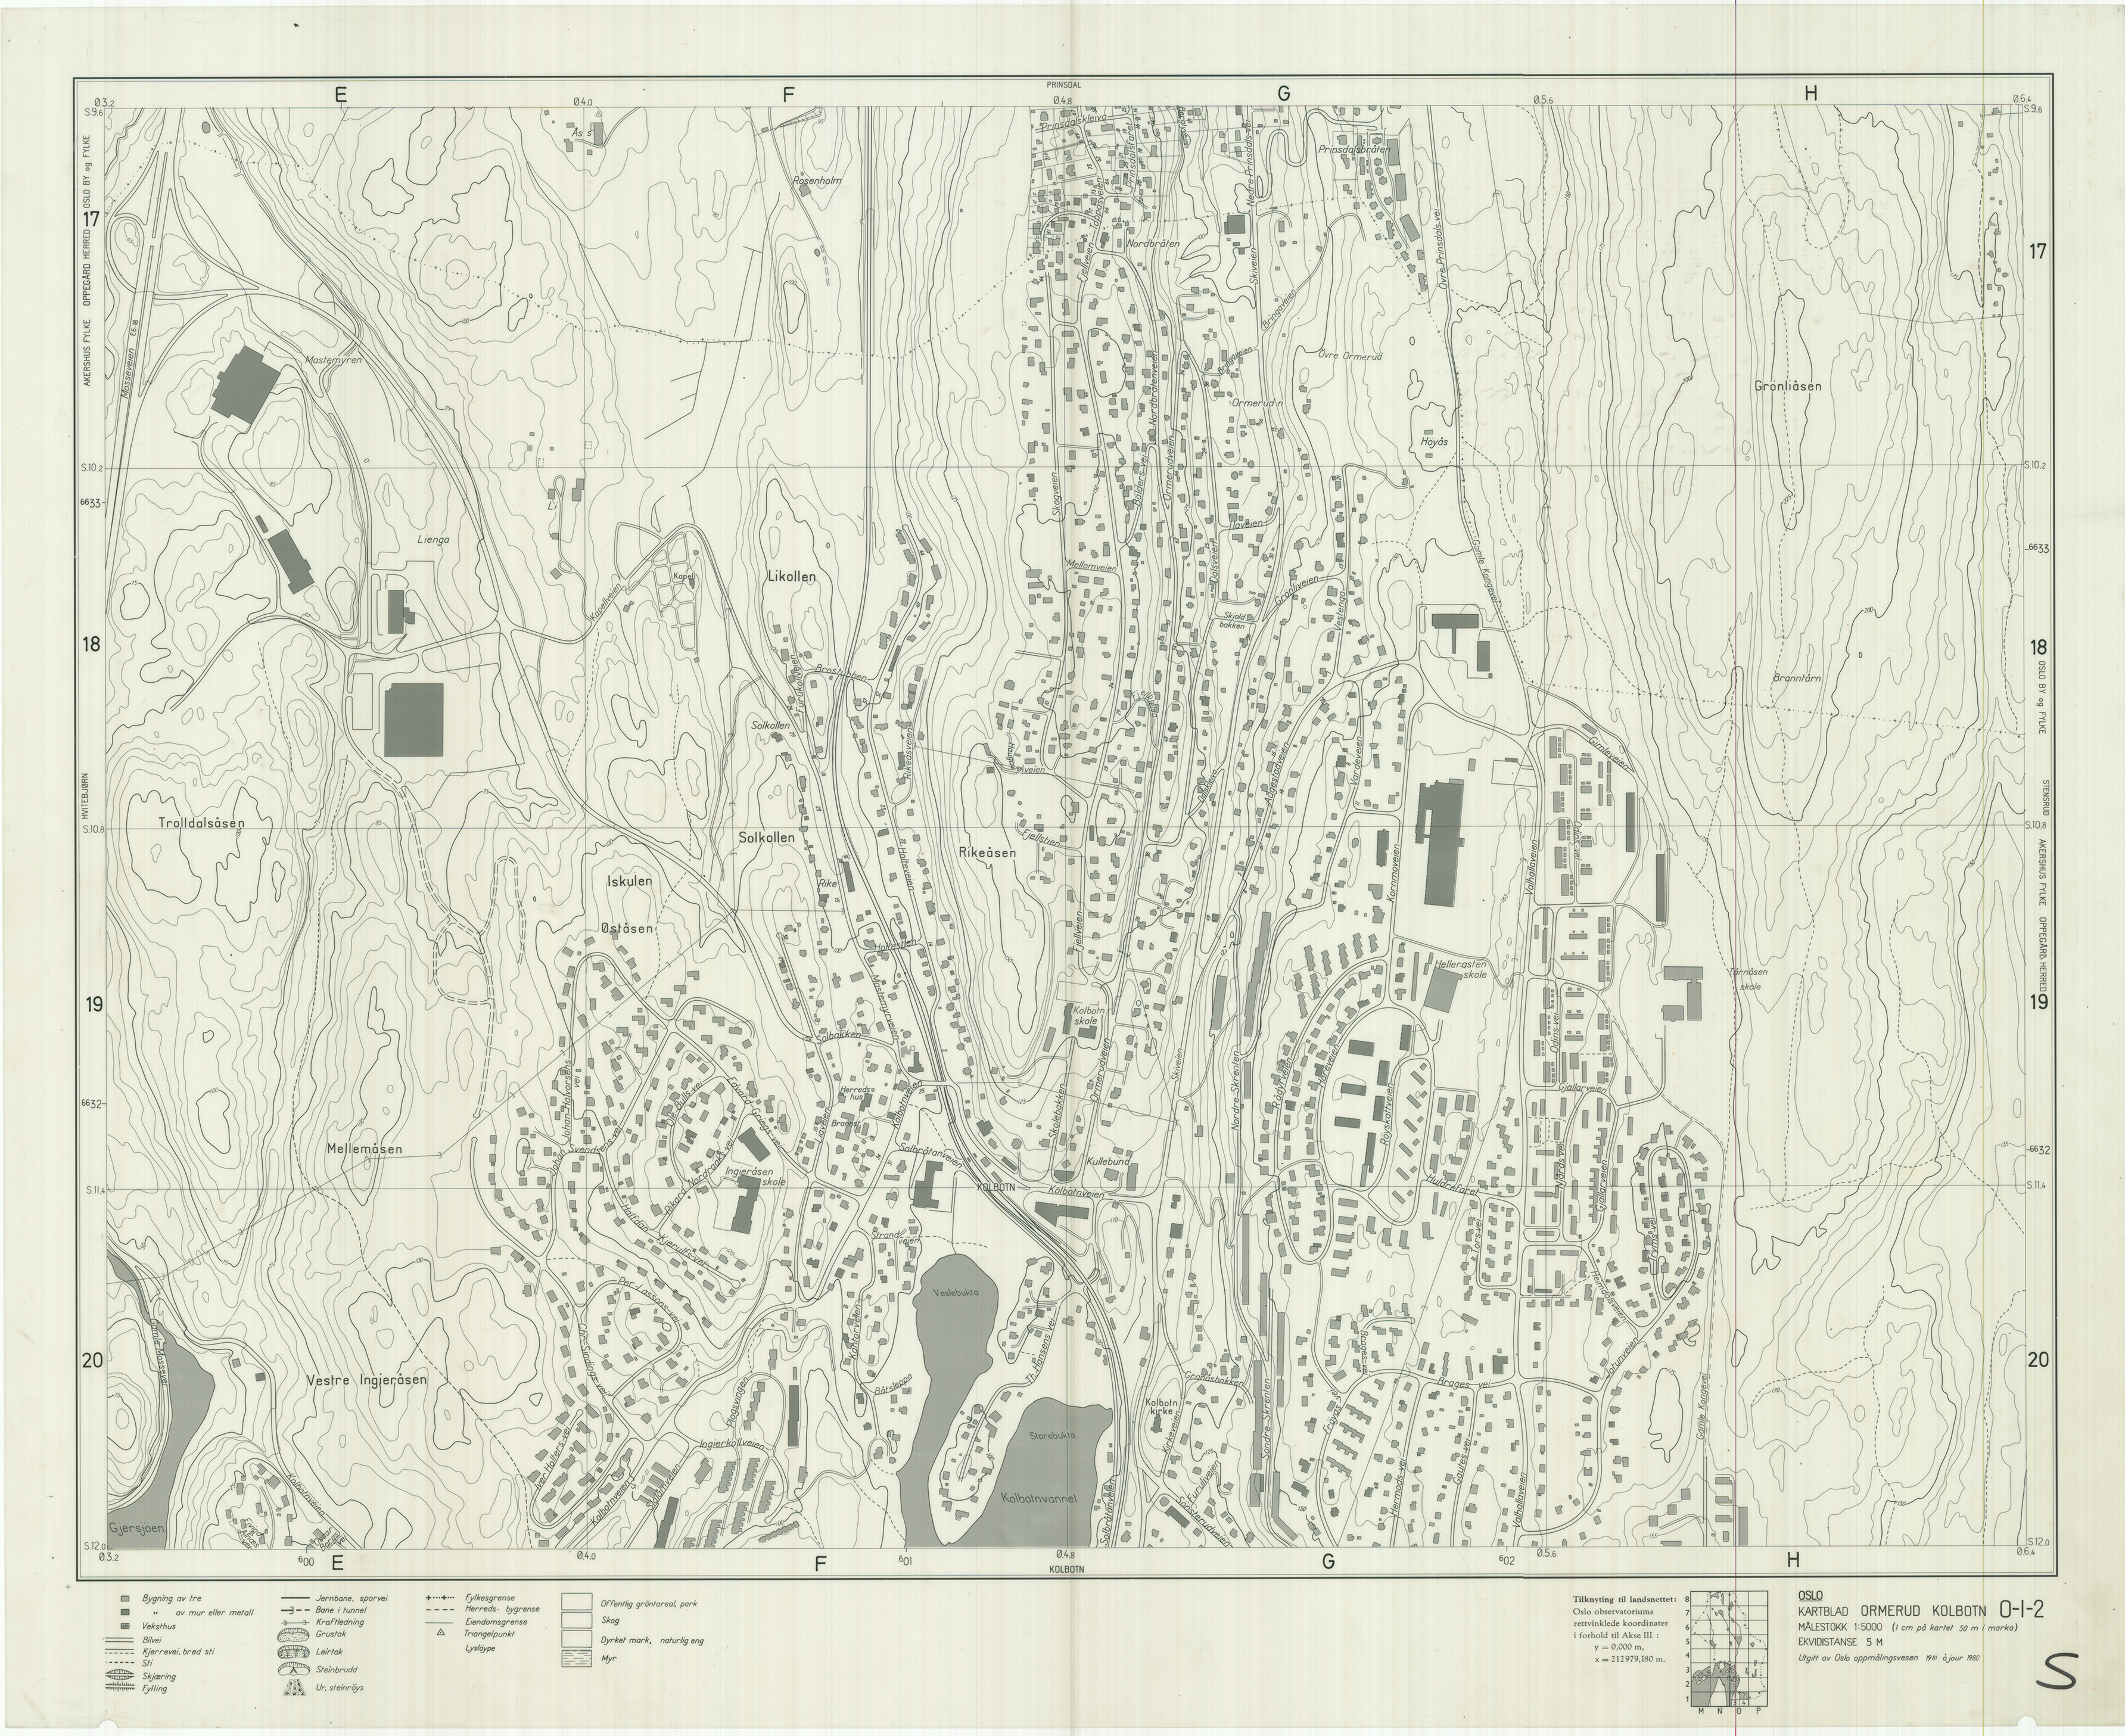 kolbotn oslo kart Oslokart 1:5000 1942 1982 kolbotn oslo kart